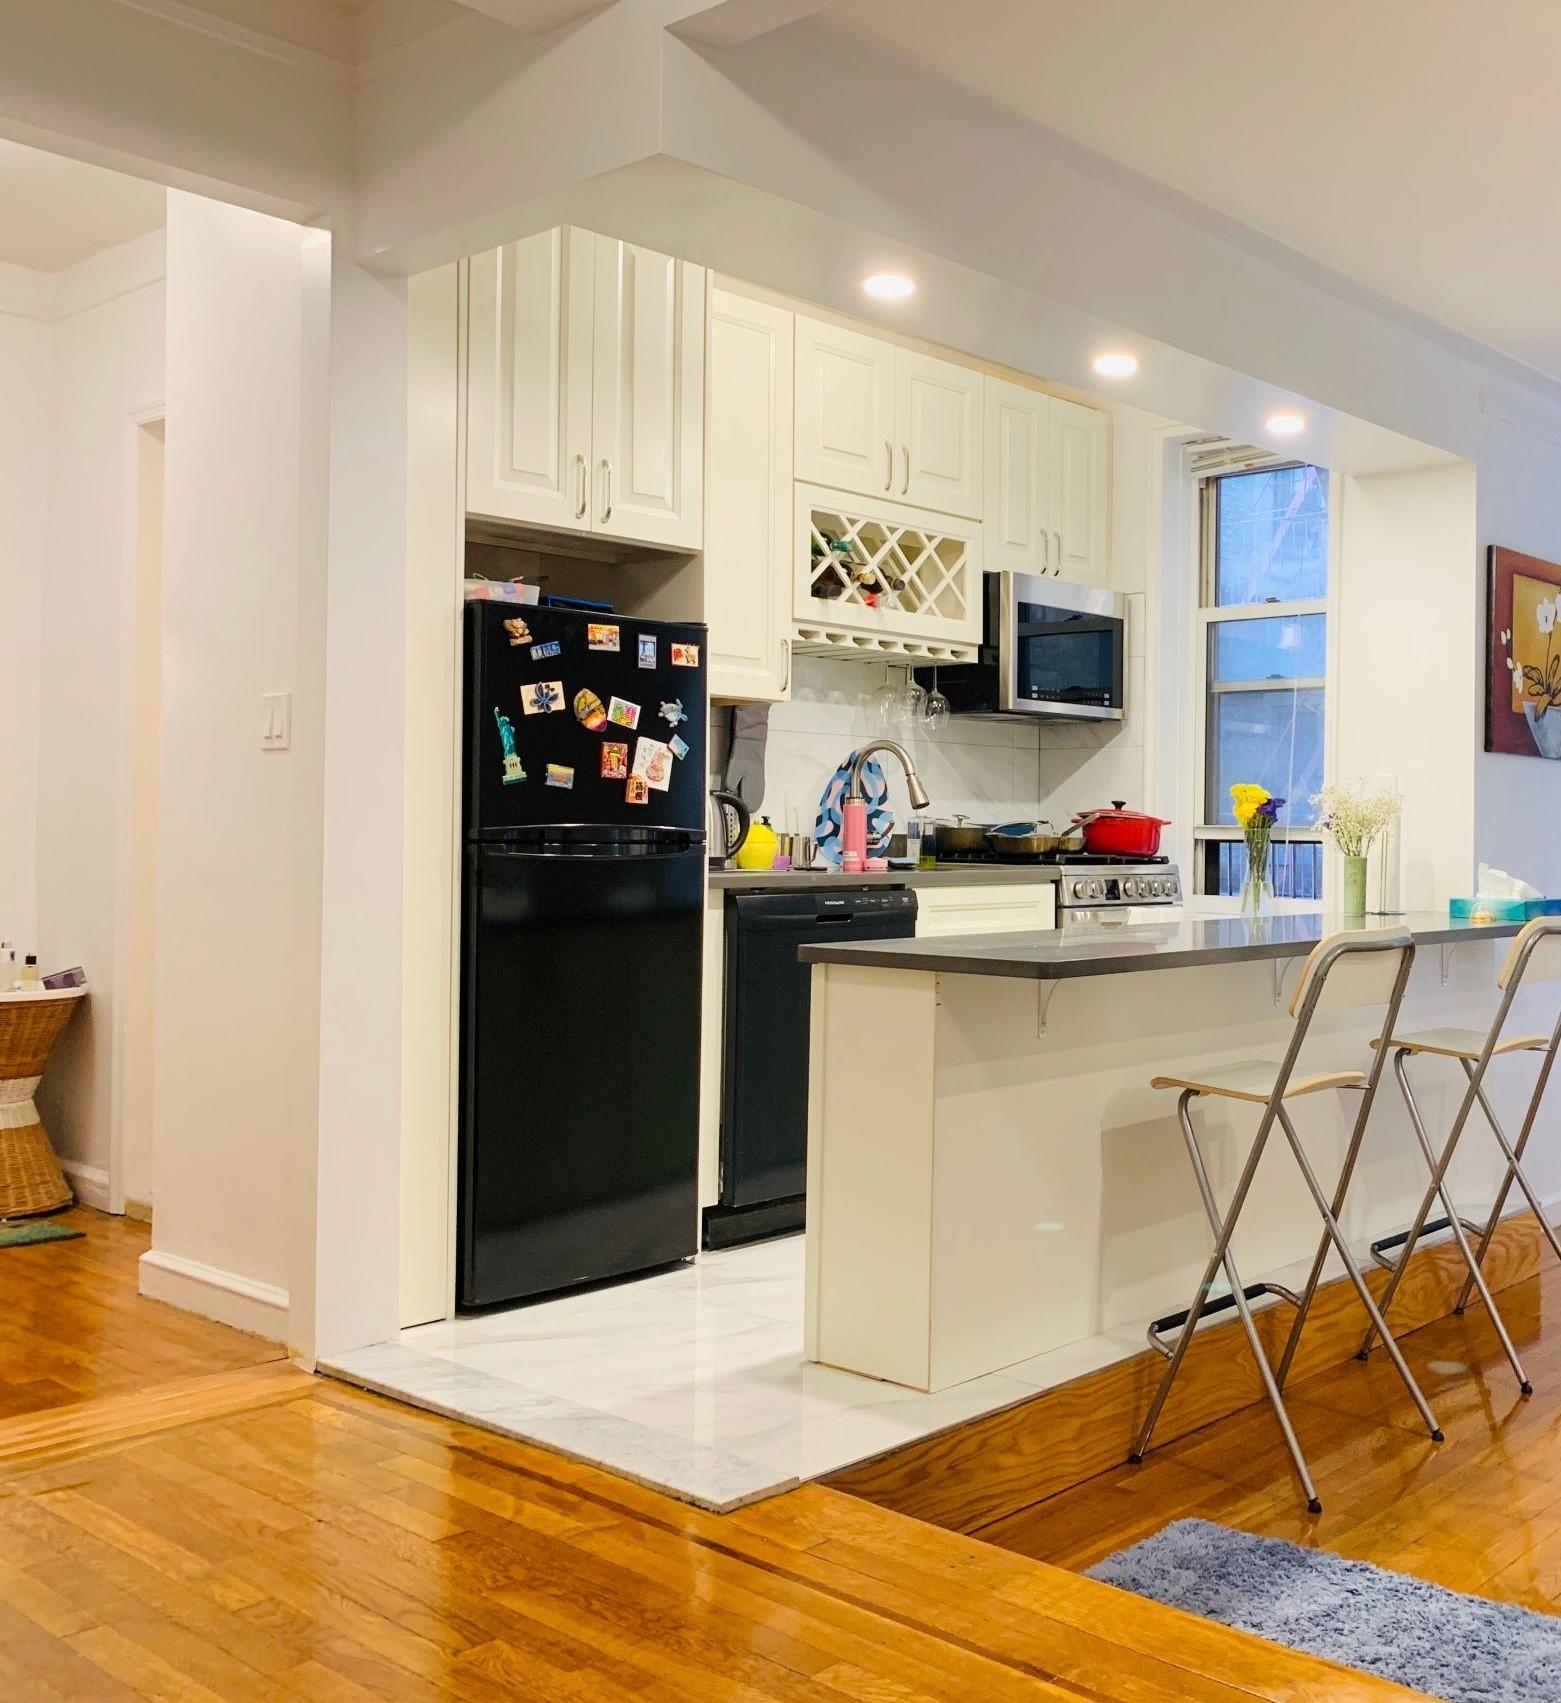 305 West 52nd Street, New York, New York, New York, United States 10019, ,1 BathroomBathrooms,Condo,Off Market,West 52nd Street,1142